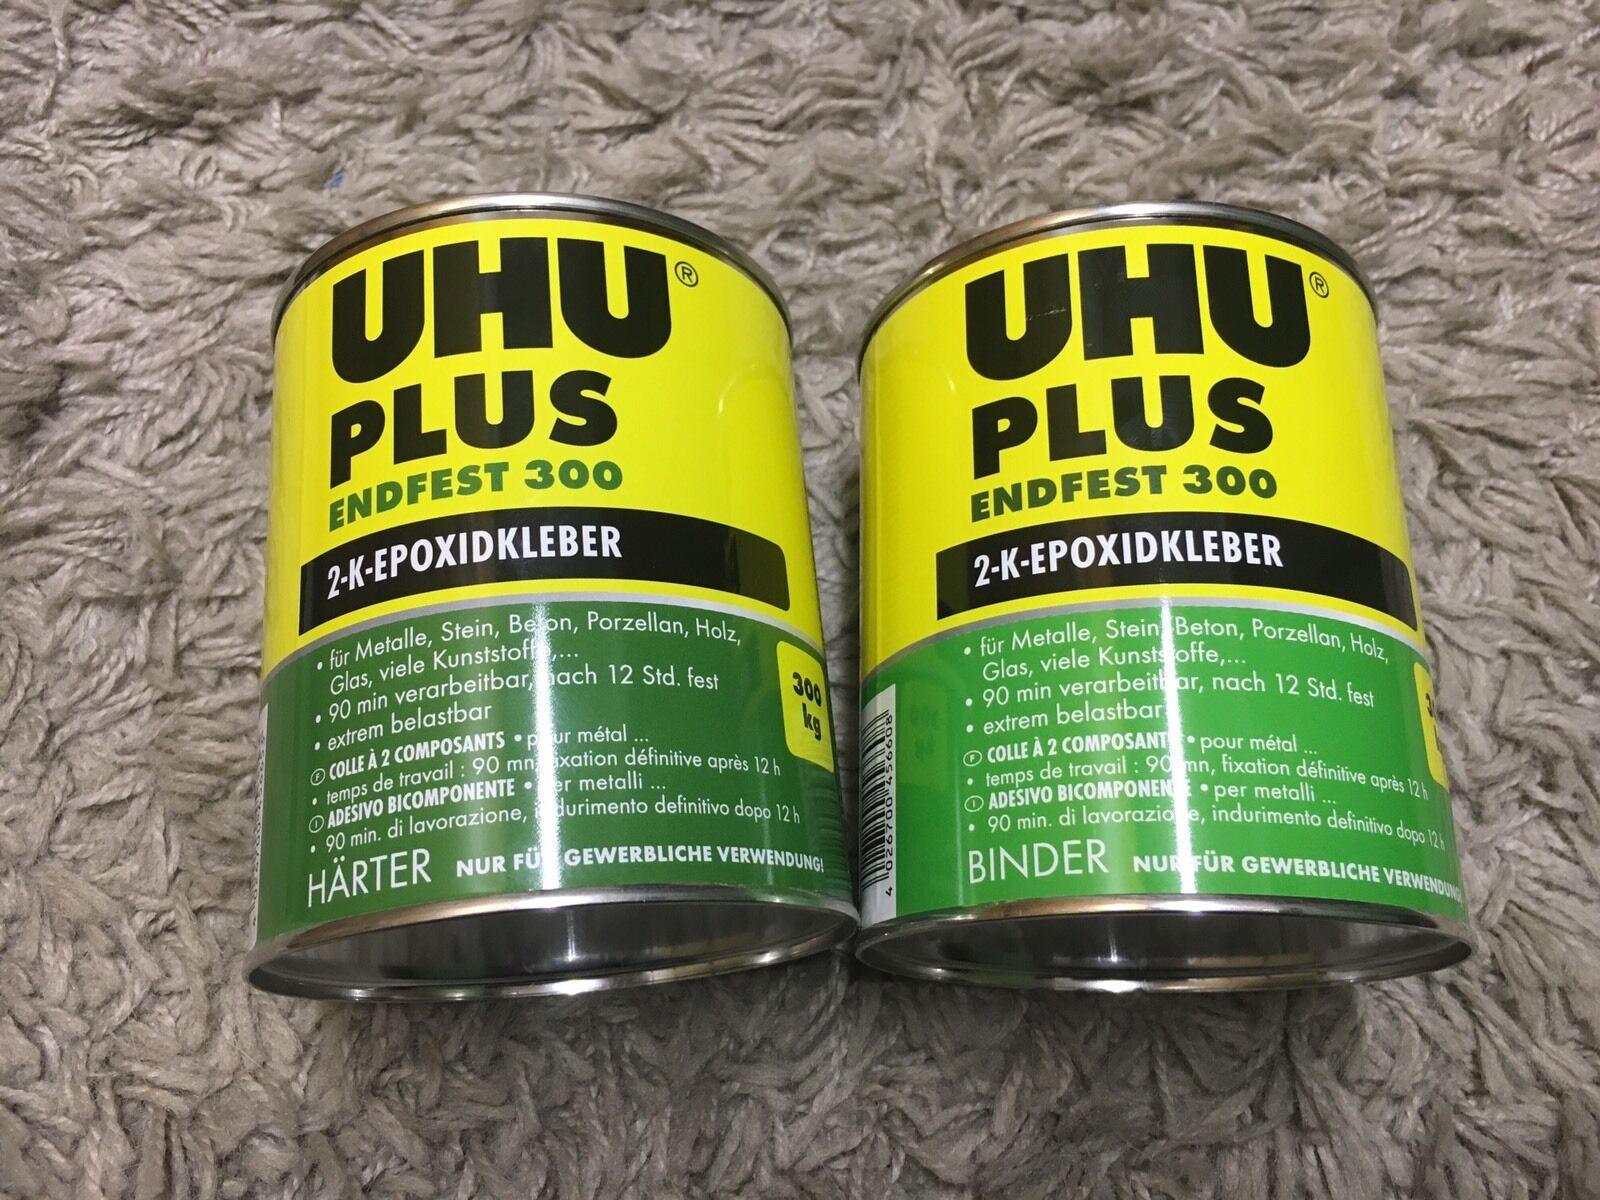 UHU Endfest 300 300 300 Binder und Härter 1,655Kg  2K Epoxid Kleber 4ca457